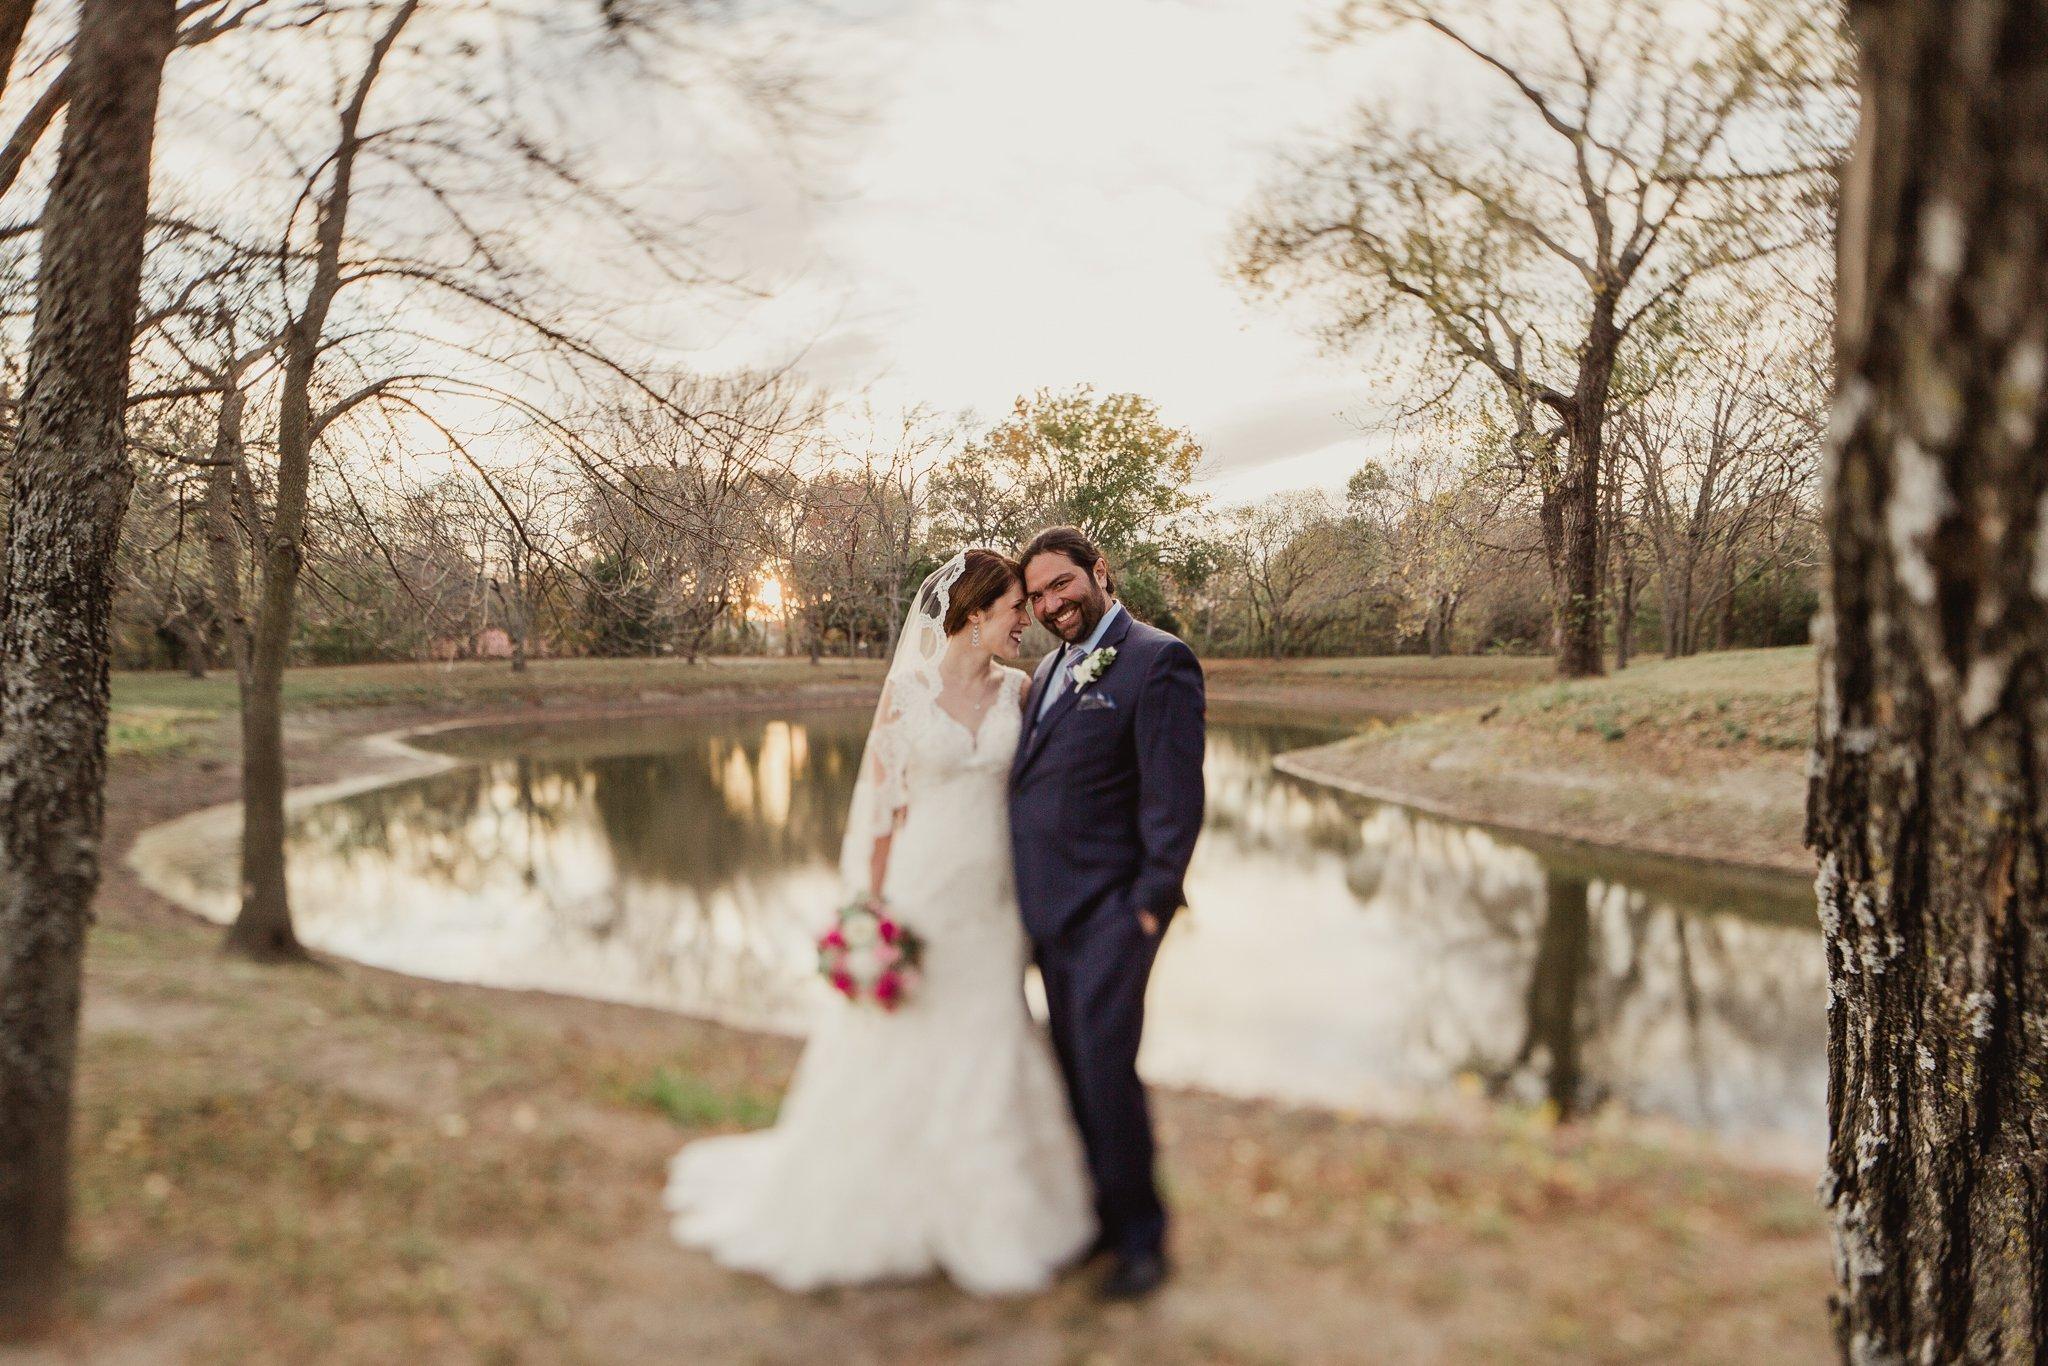 Caskey Wedding - Shaun Menary Photo - Couple